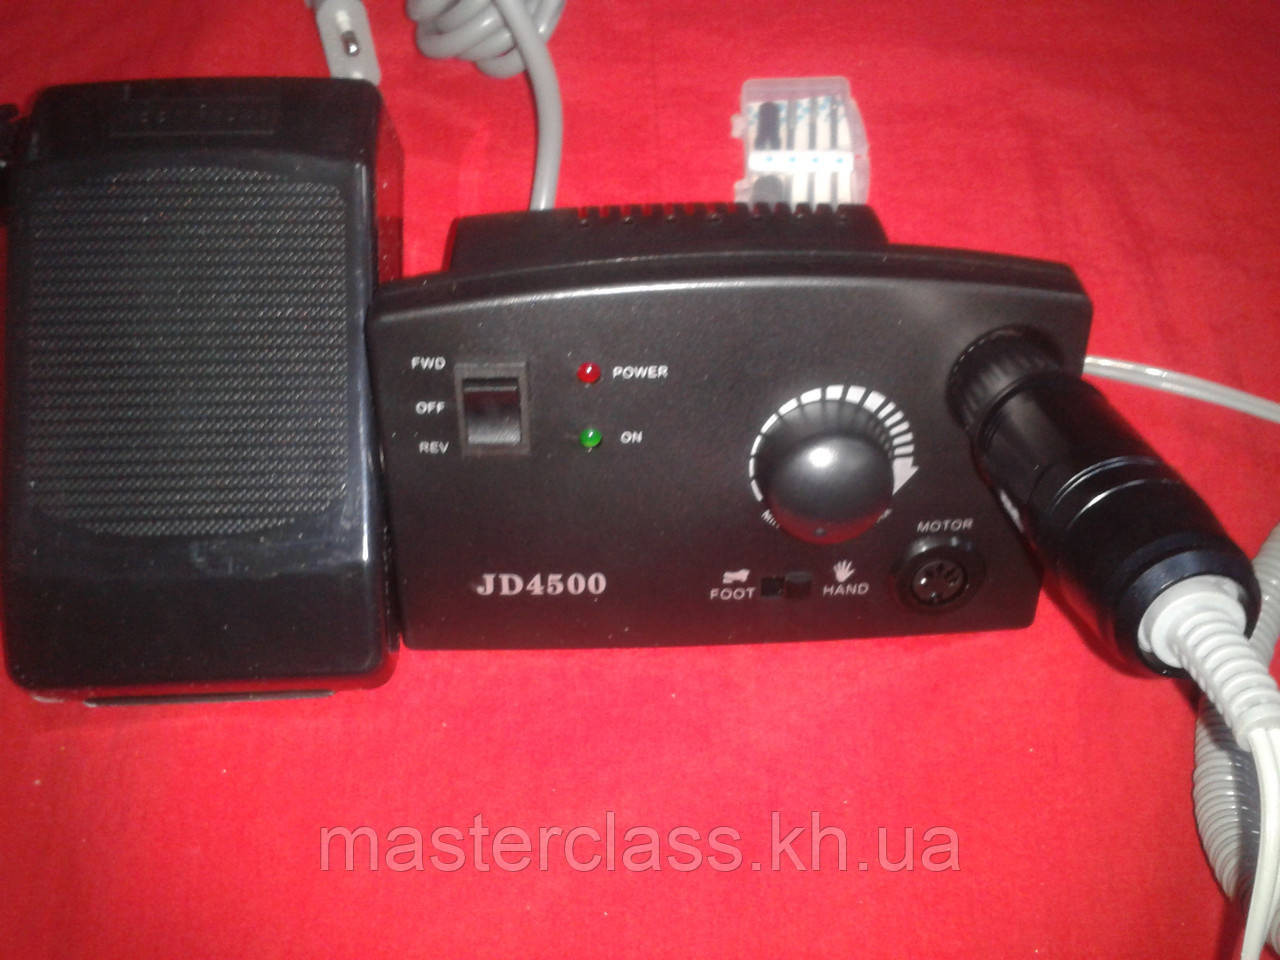 Фрезер JD-4500